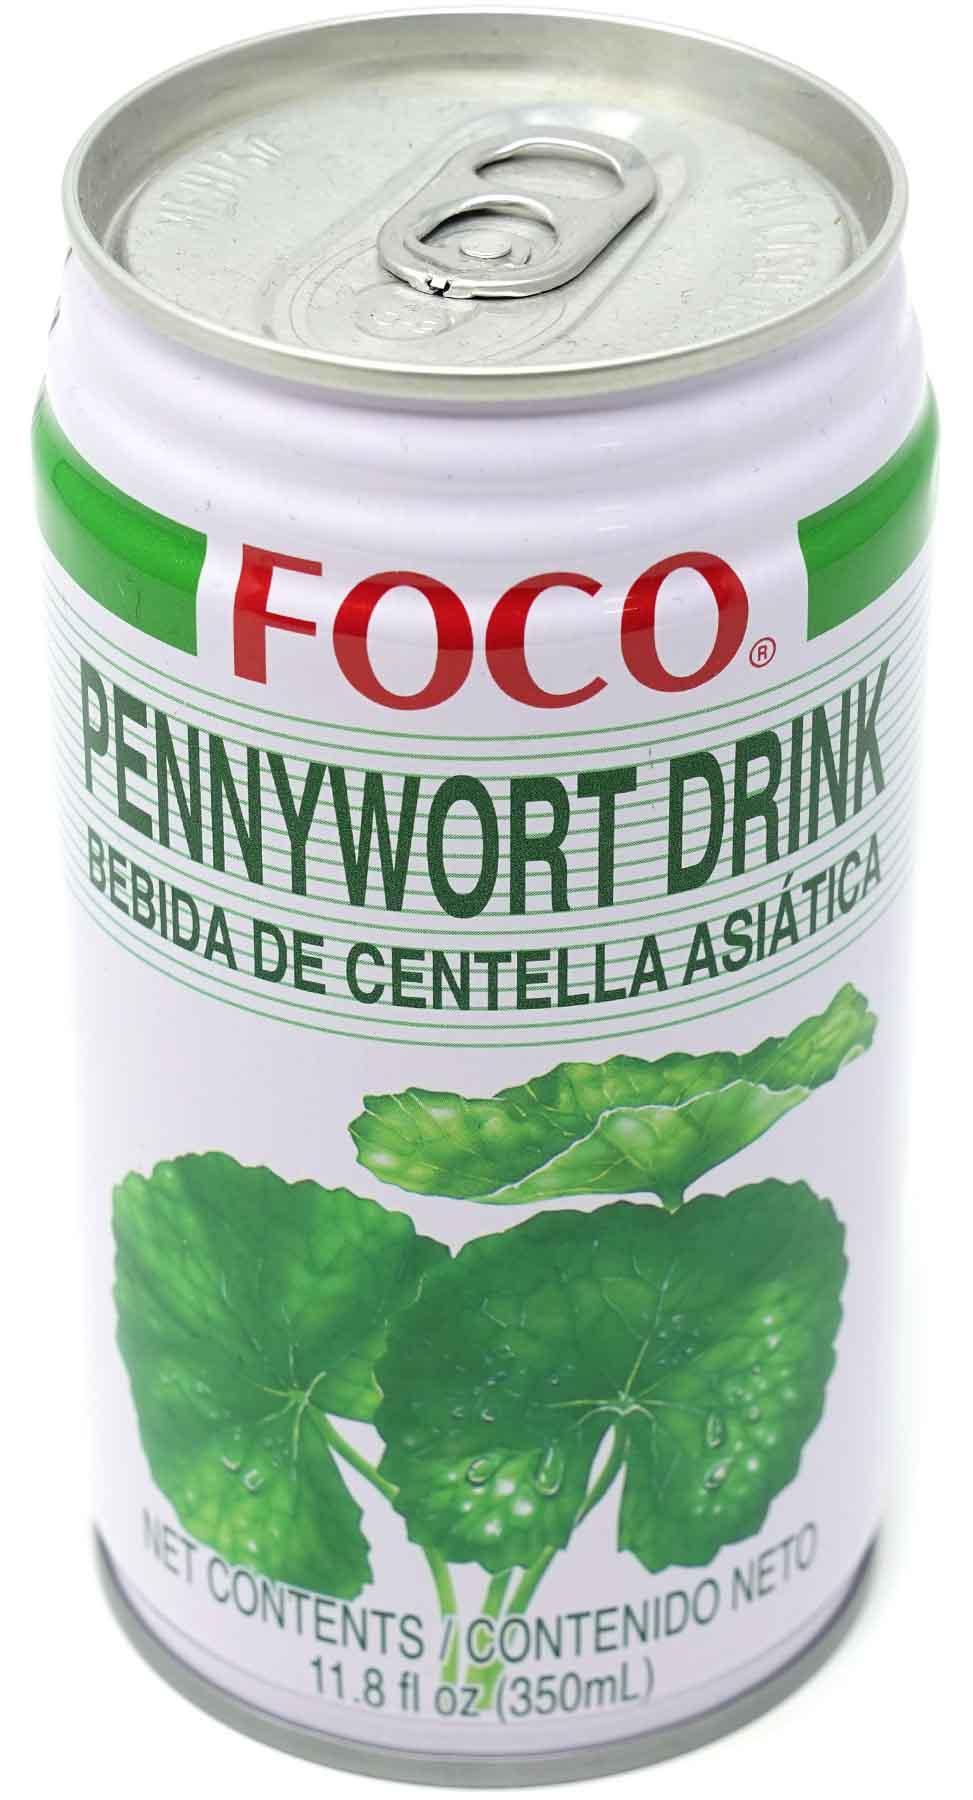 Foco Pennywort Getränk, 350 ml